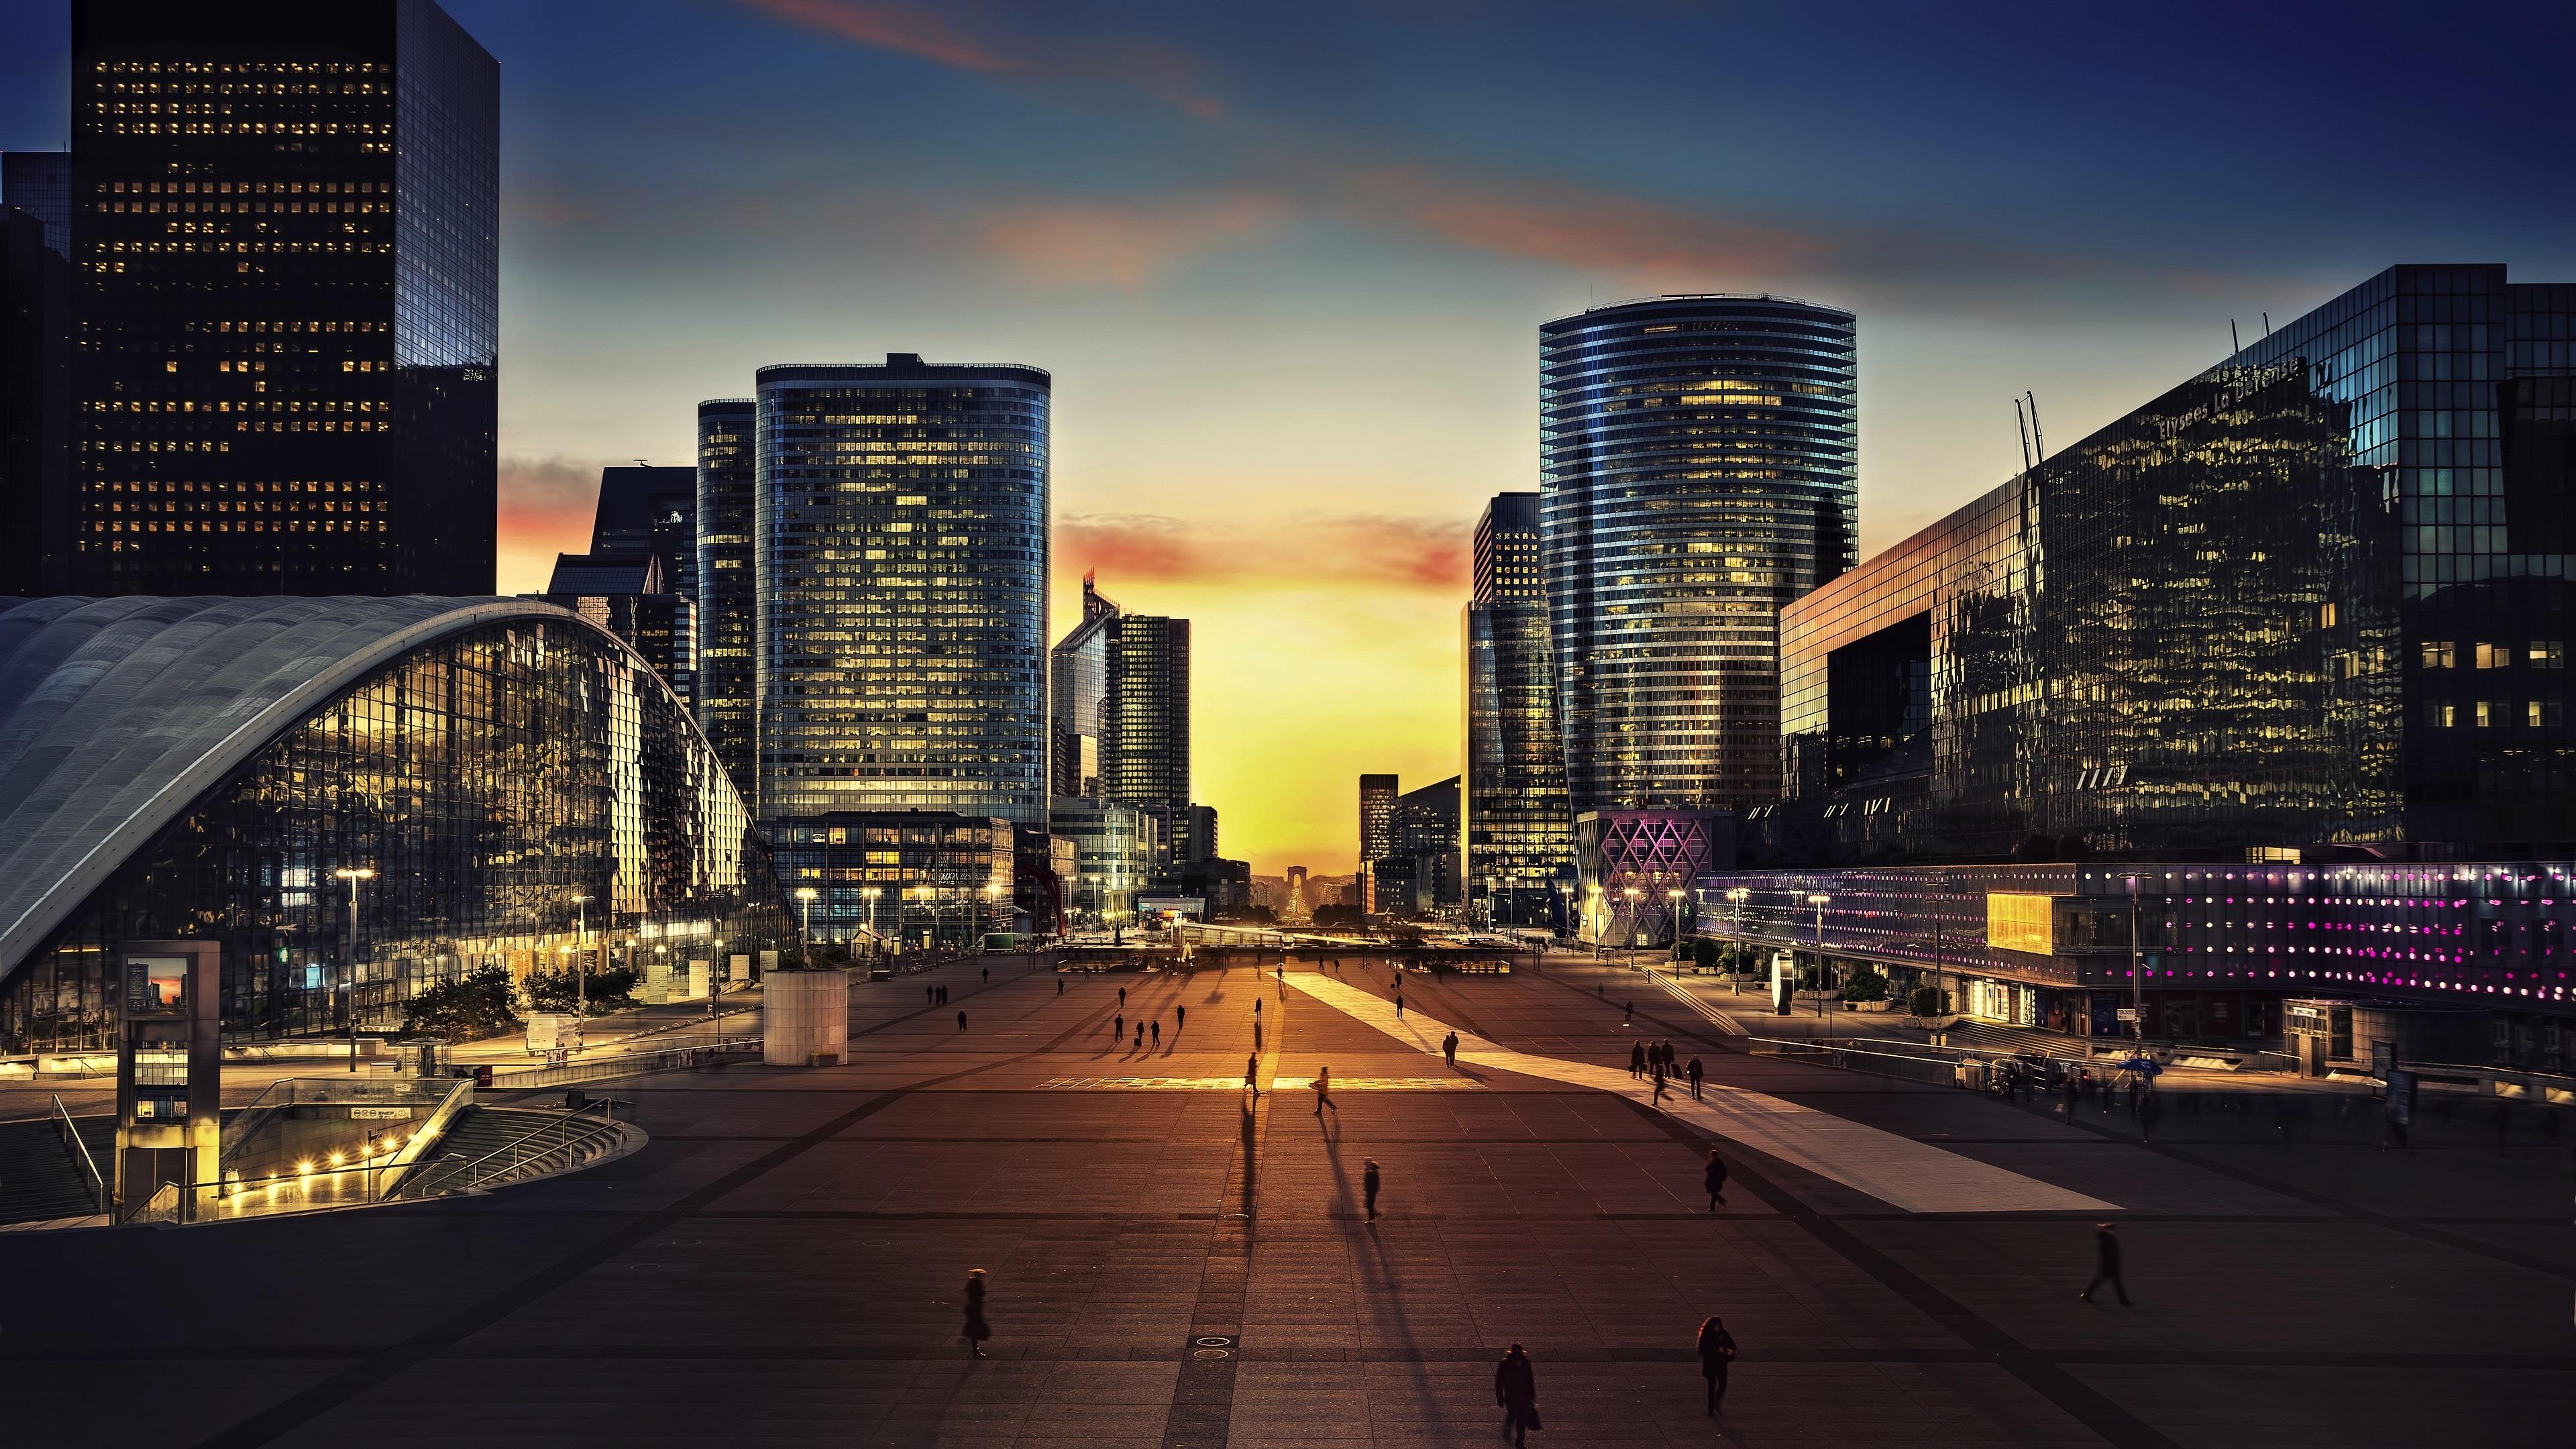 Samsung Galaxy S4 Wallpapers Hd Download Download 3840x2400 Wallpaper Arc De Triomphe Paris City